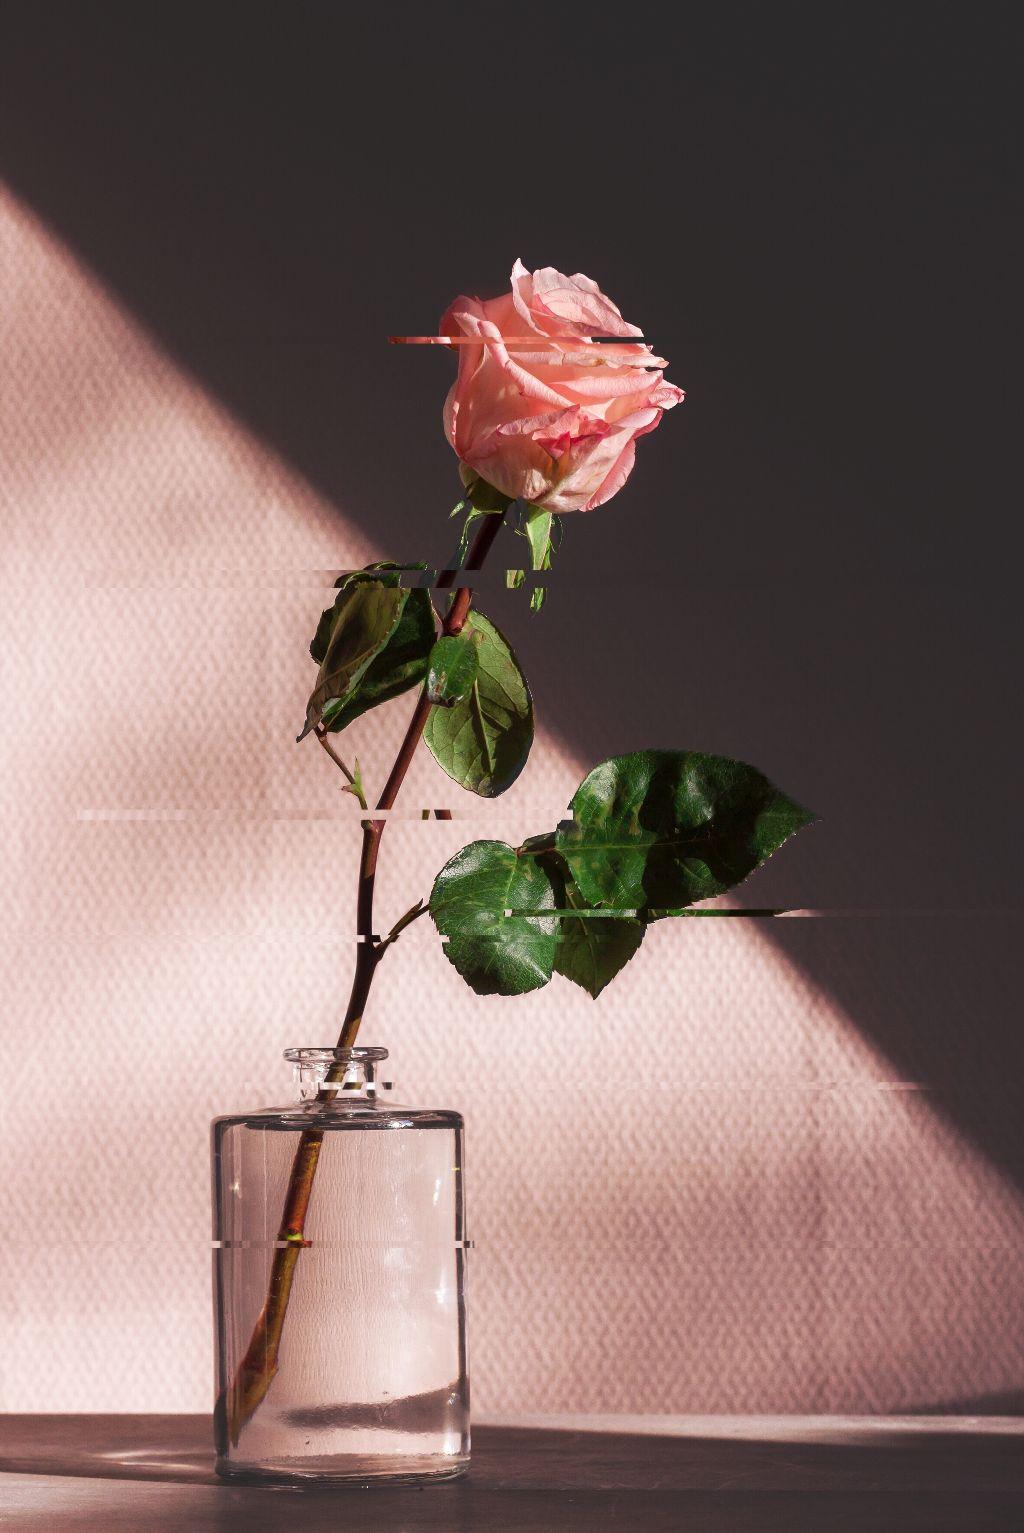 Glitched Love Rose Glitch Pink Vintage Tumblr Edit Mye